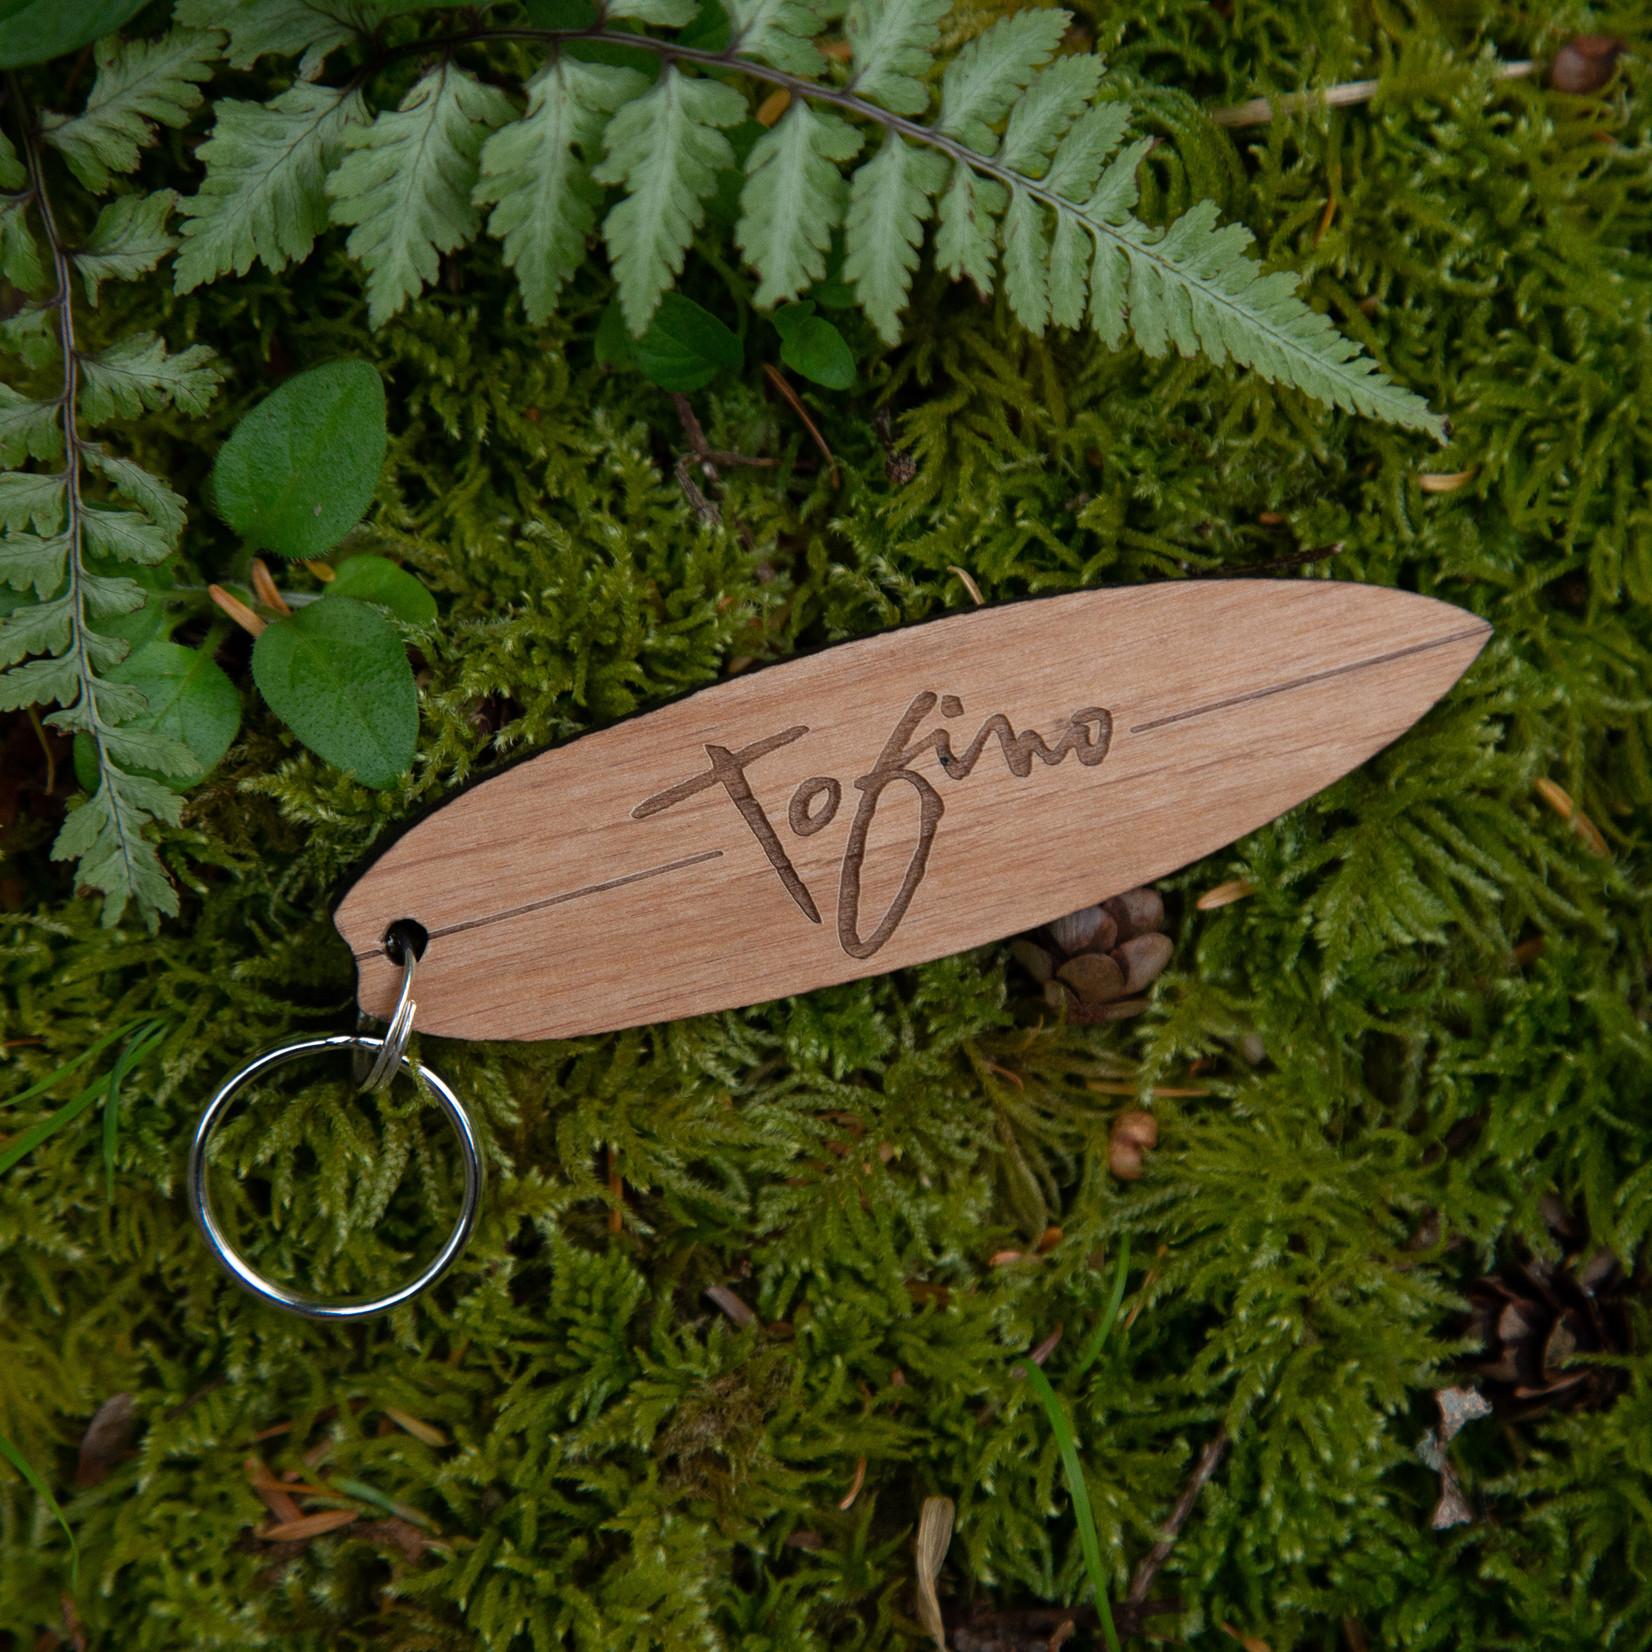 Tuff Town Toys key chain surf board Tofino